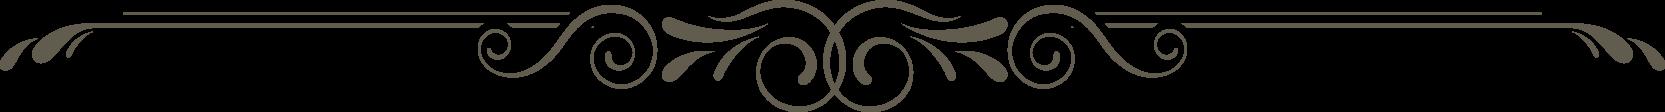 Scroll Divider